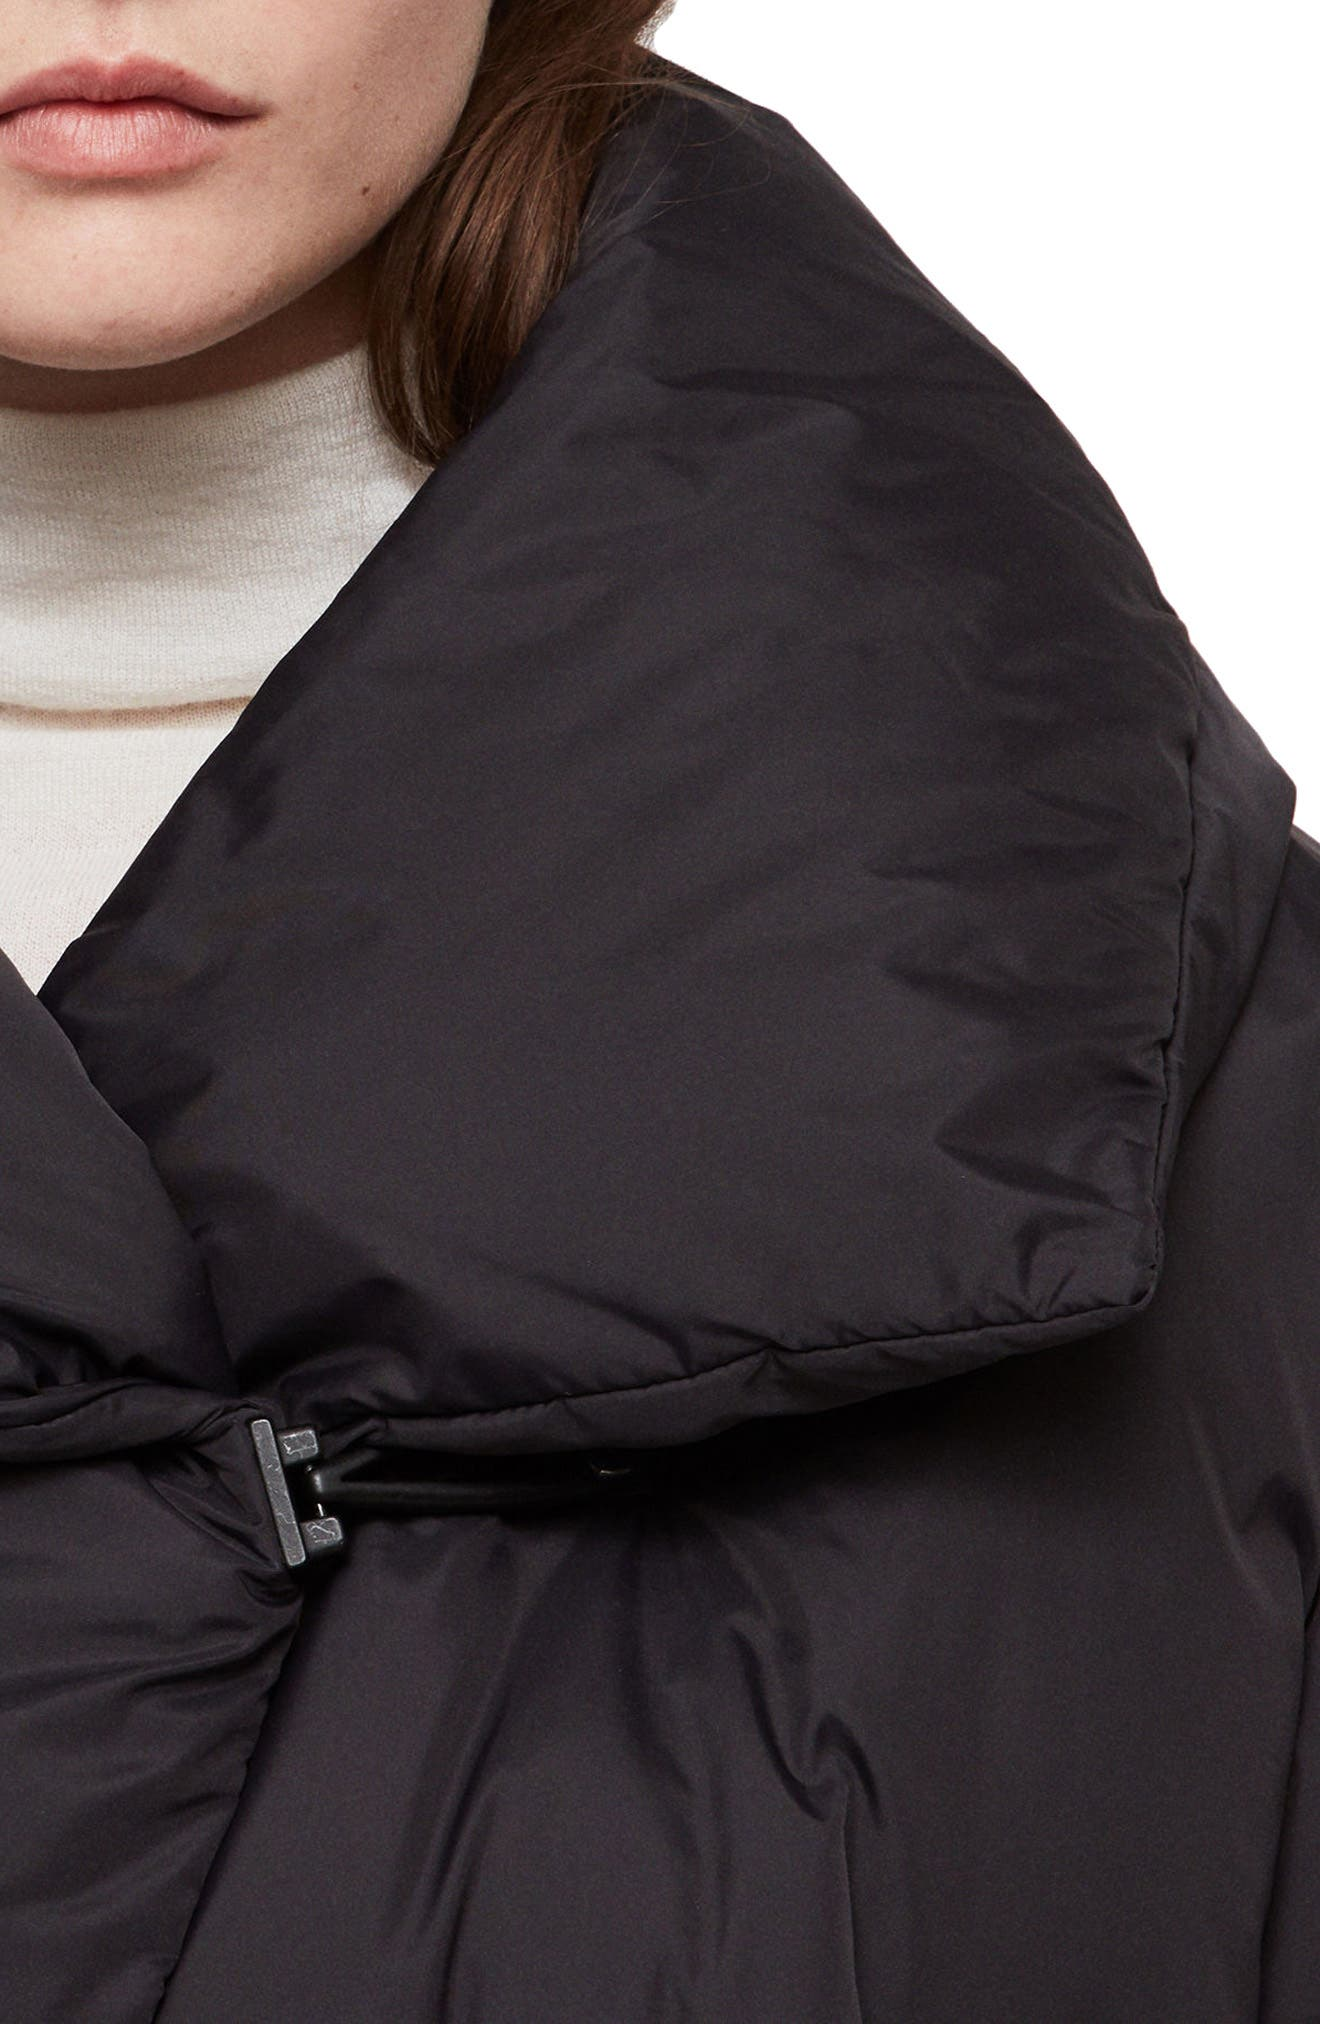 ALLSAINTS, Vrai Avia Puffer Jacket, Alternate thumbnail 3, color, 001